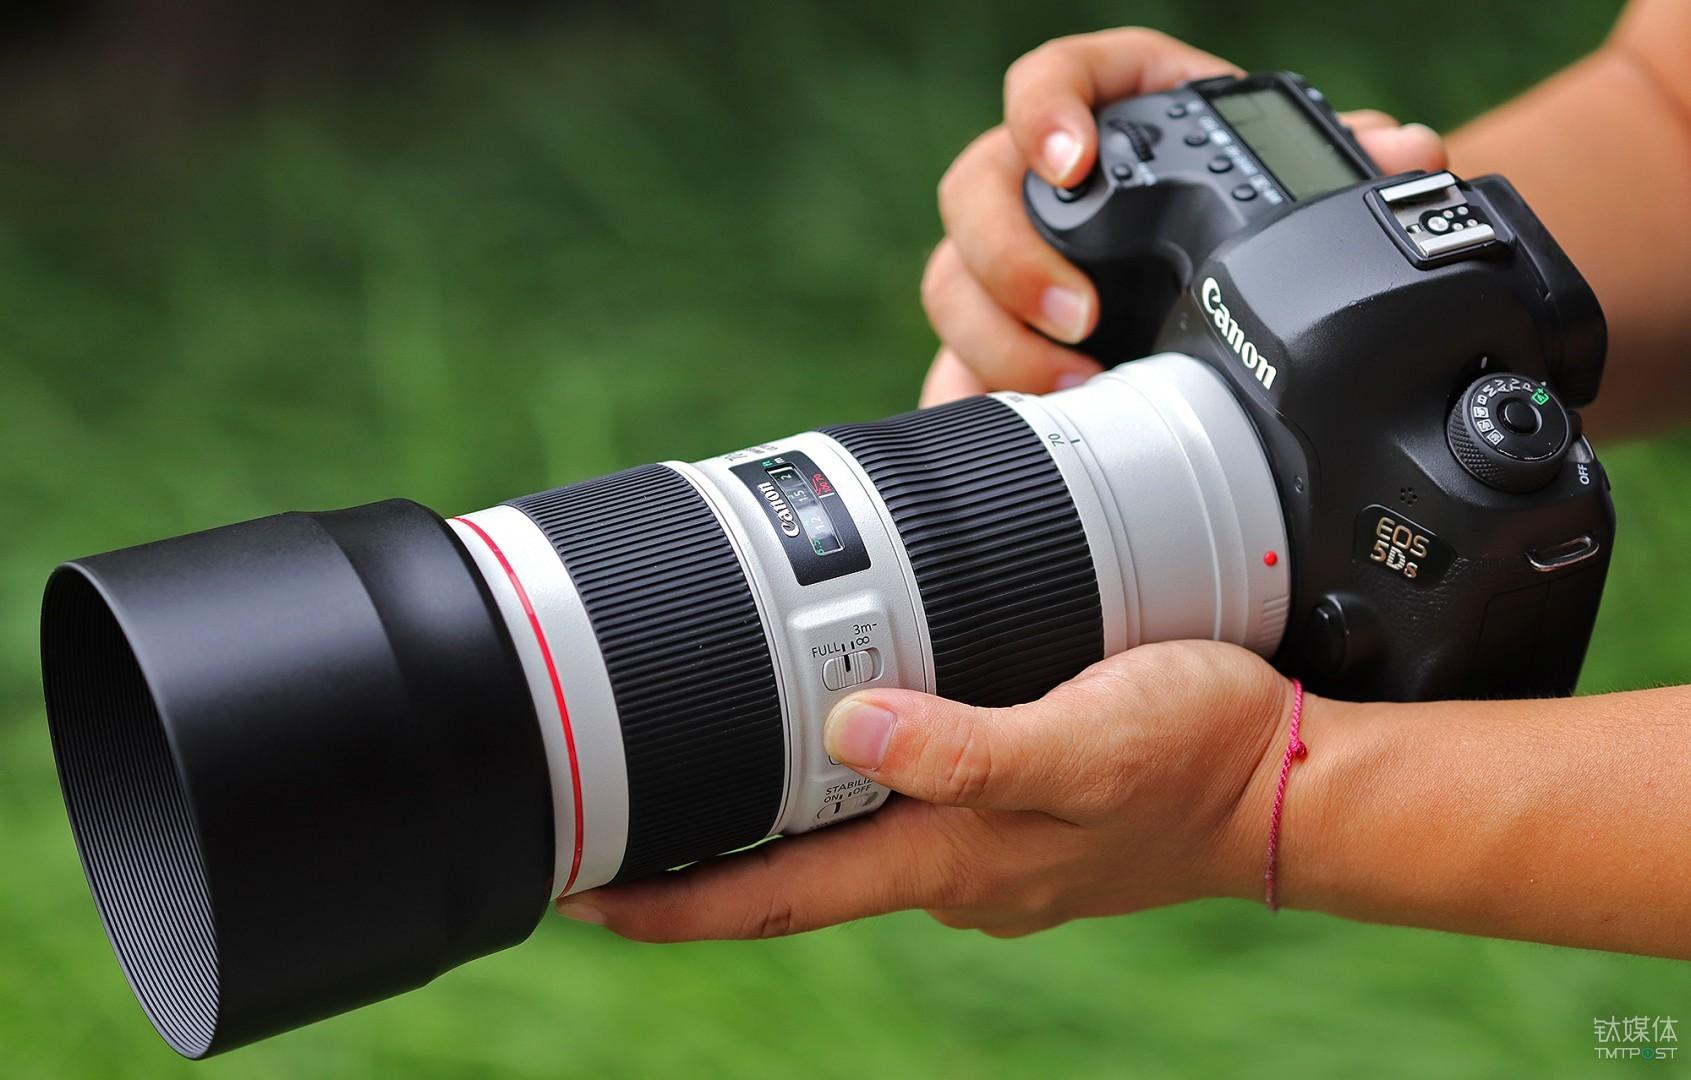 佳能EF 70-200mm f/4L IS II USM镜头+EOS 5DS机身